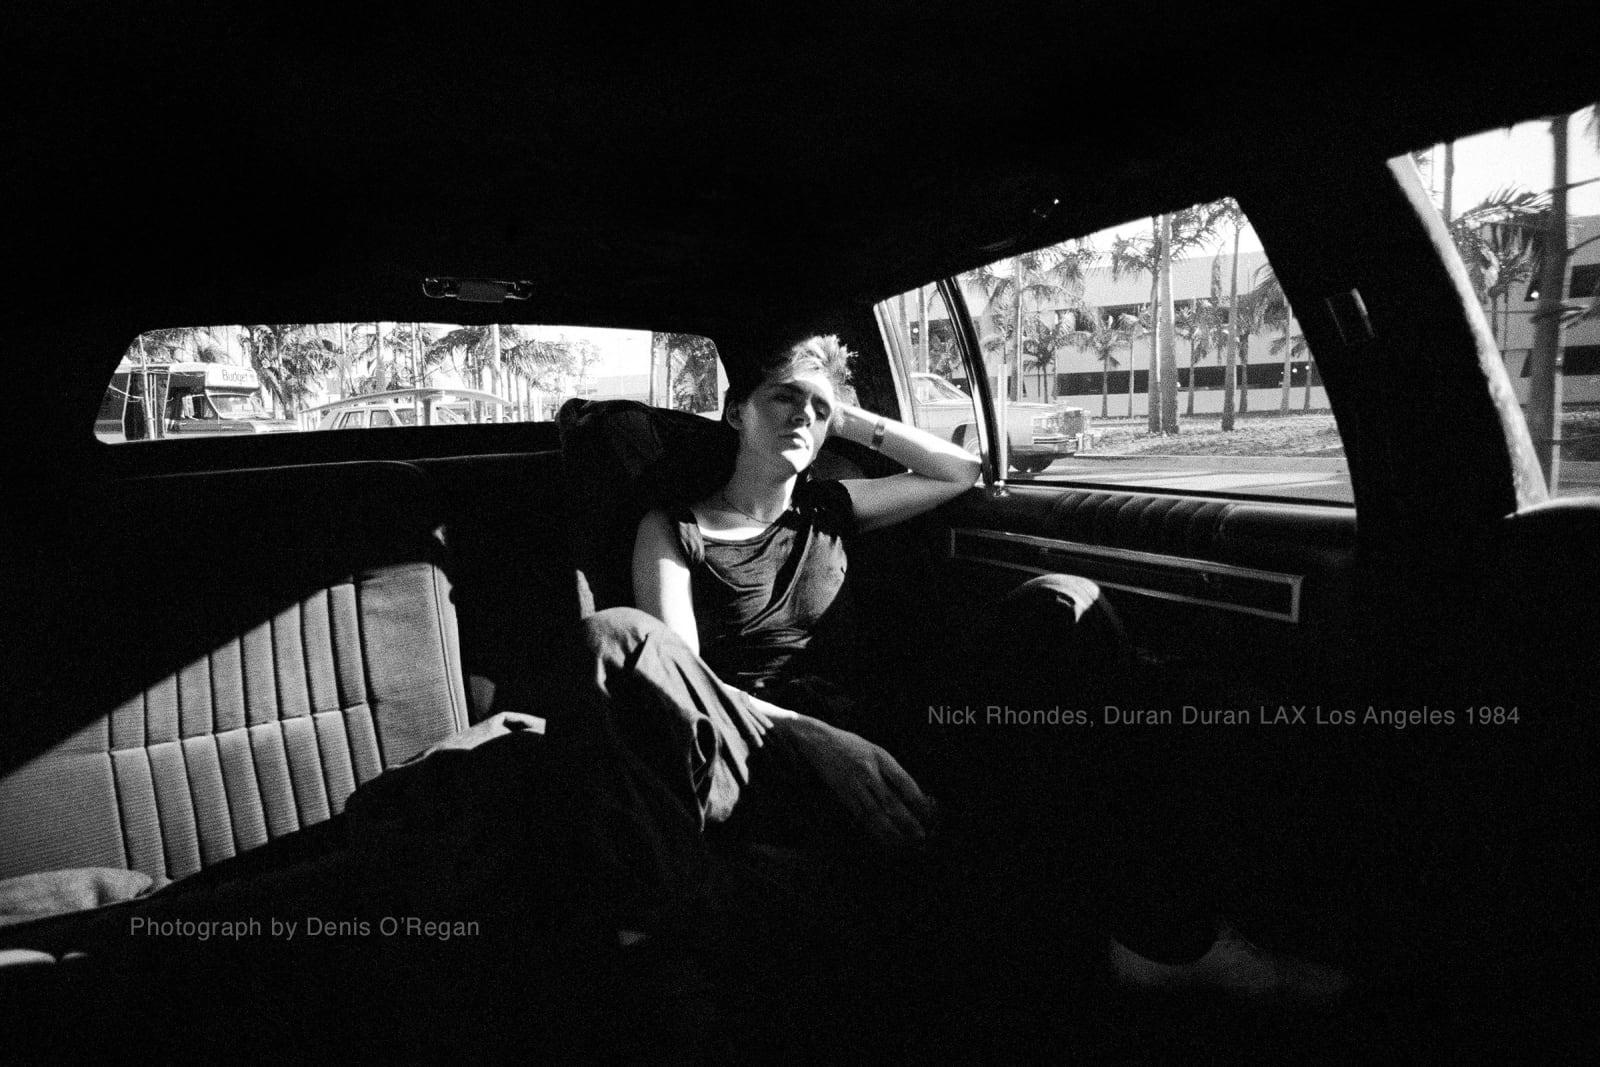 DURAN DURAN, Nick Rhodes LAX Los Angeles, 1984